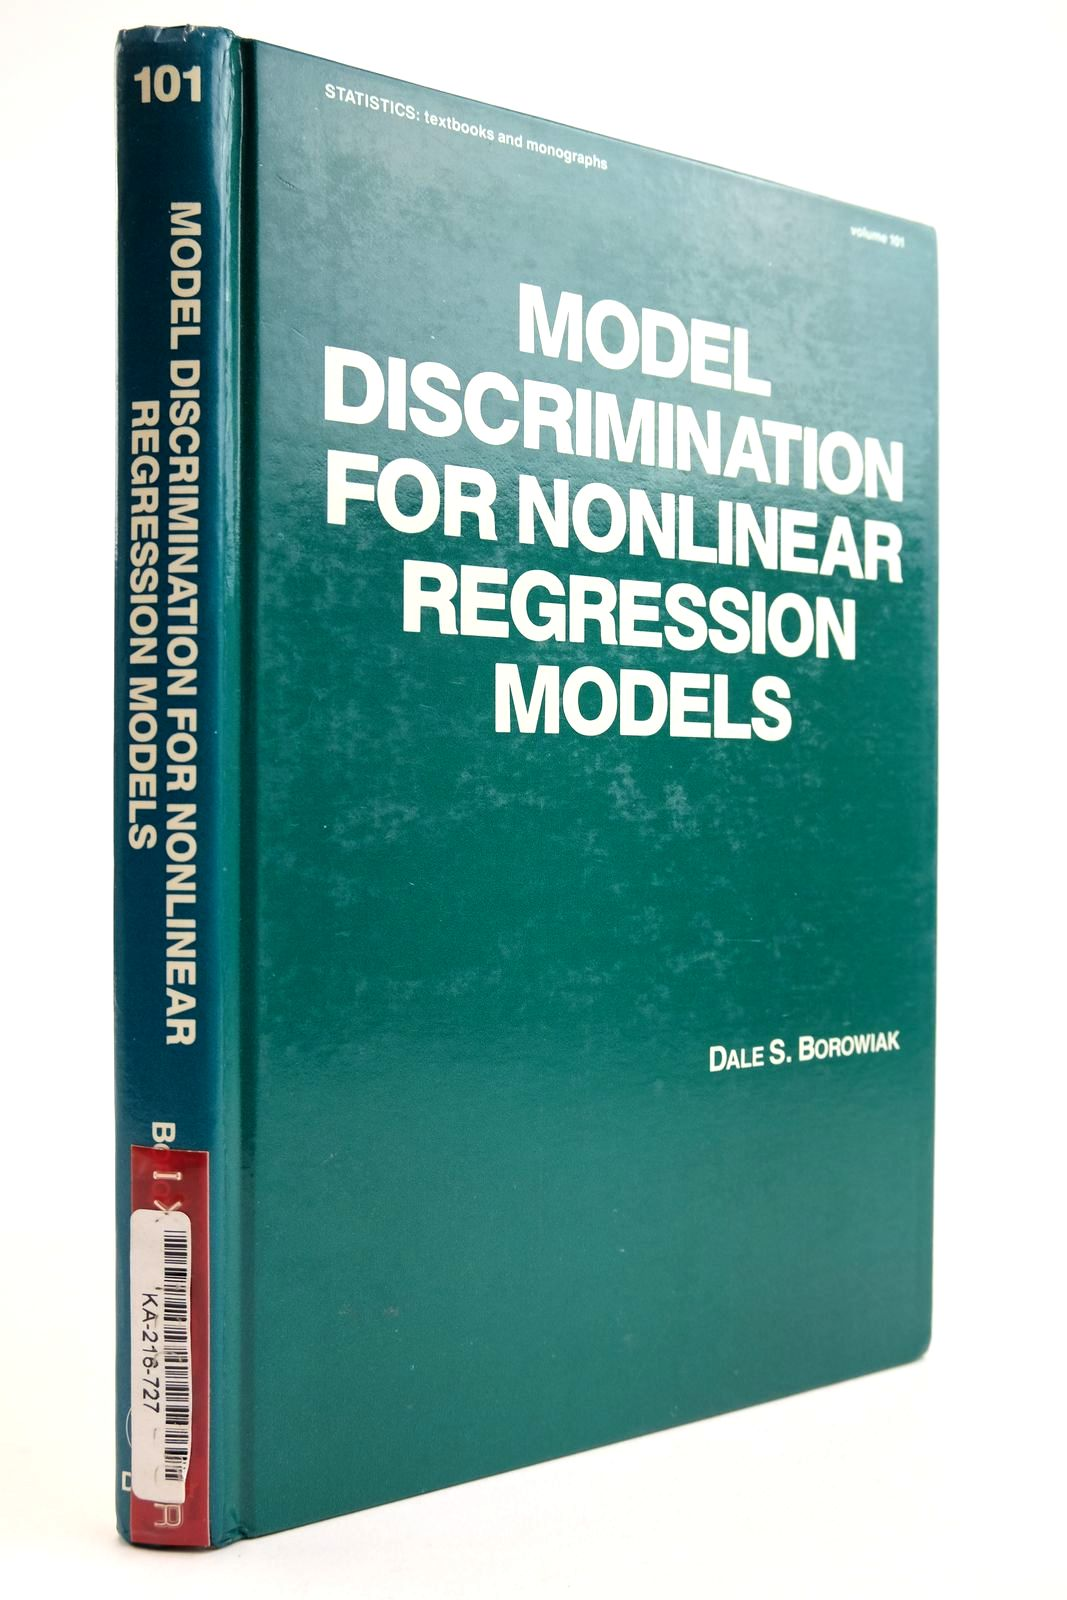 Photo of MODEL DISCRIMINATION FOR NONLINEAR REGRESSION MODELS written by Borowiak, Dale S. published by Marcel Dekker (STOCK CODE: 2134107)  for sale by Stella & Rose's Books